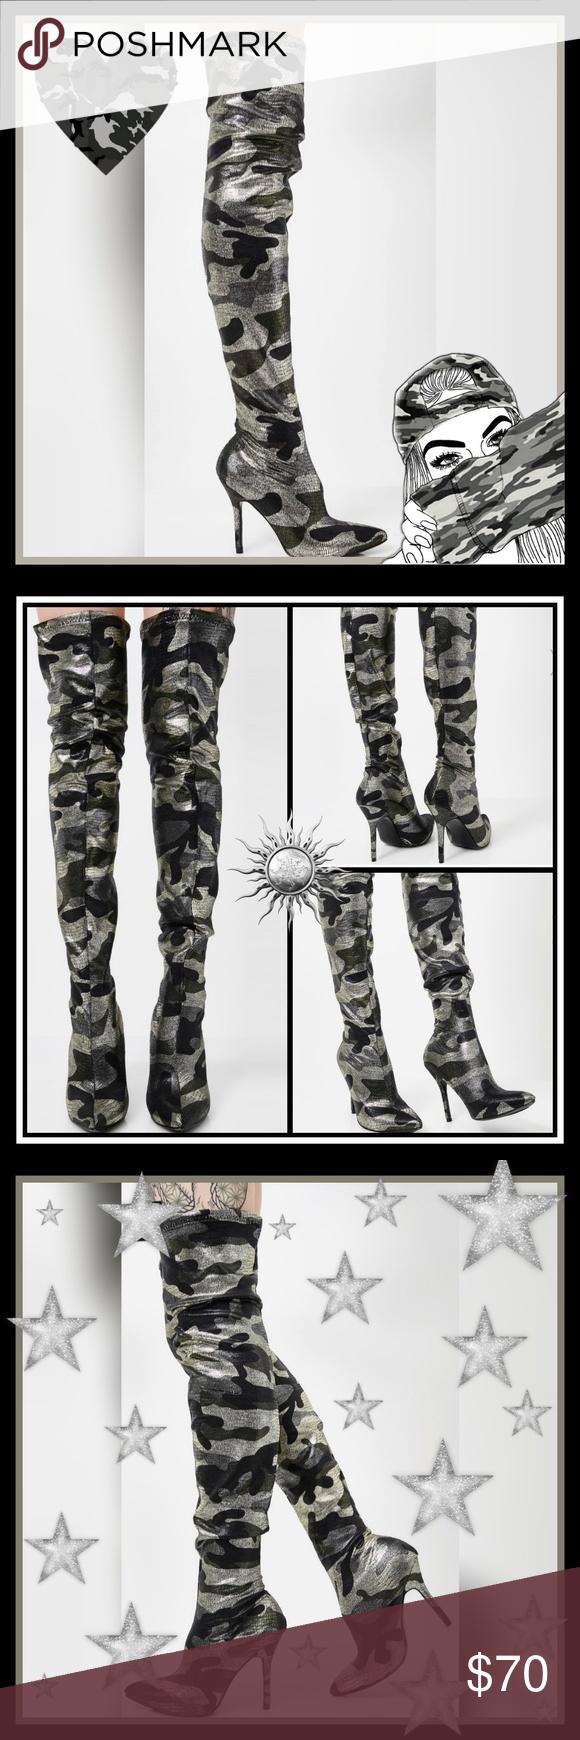 New X_Mackinj Glam Campaign Thigh High Camo Heels NWT #boydollsincamo